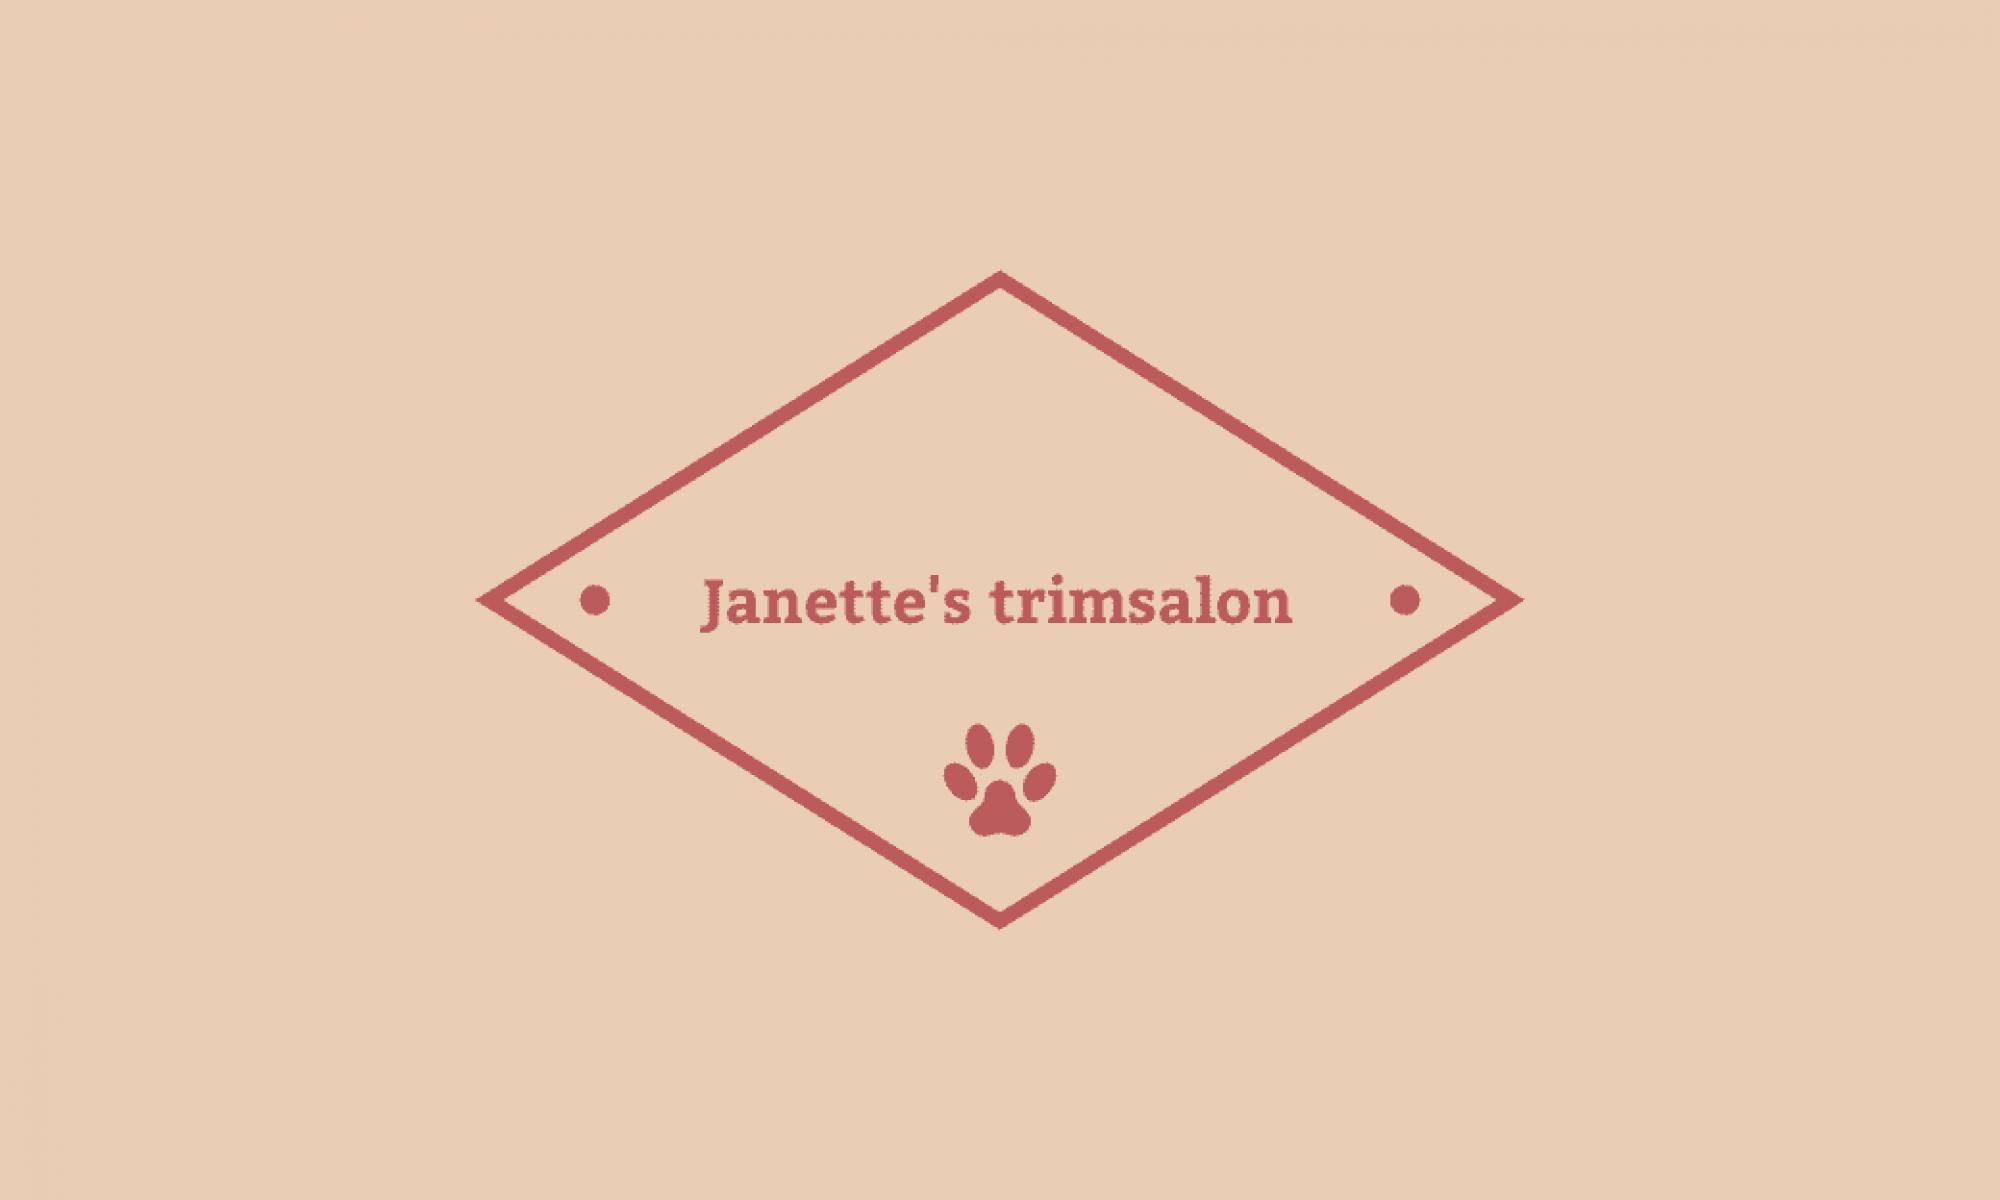 Janette's trimsalon